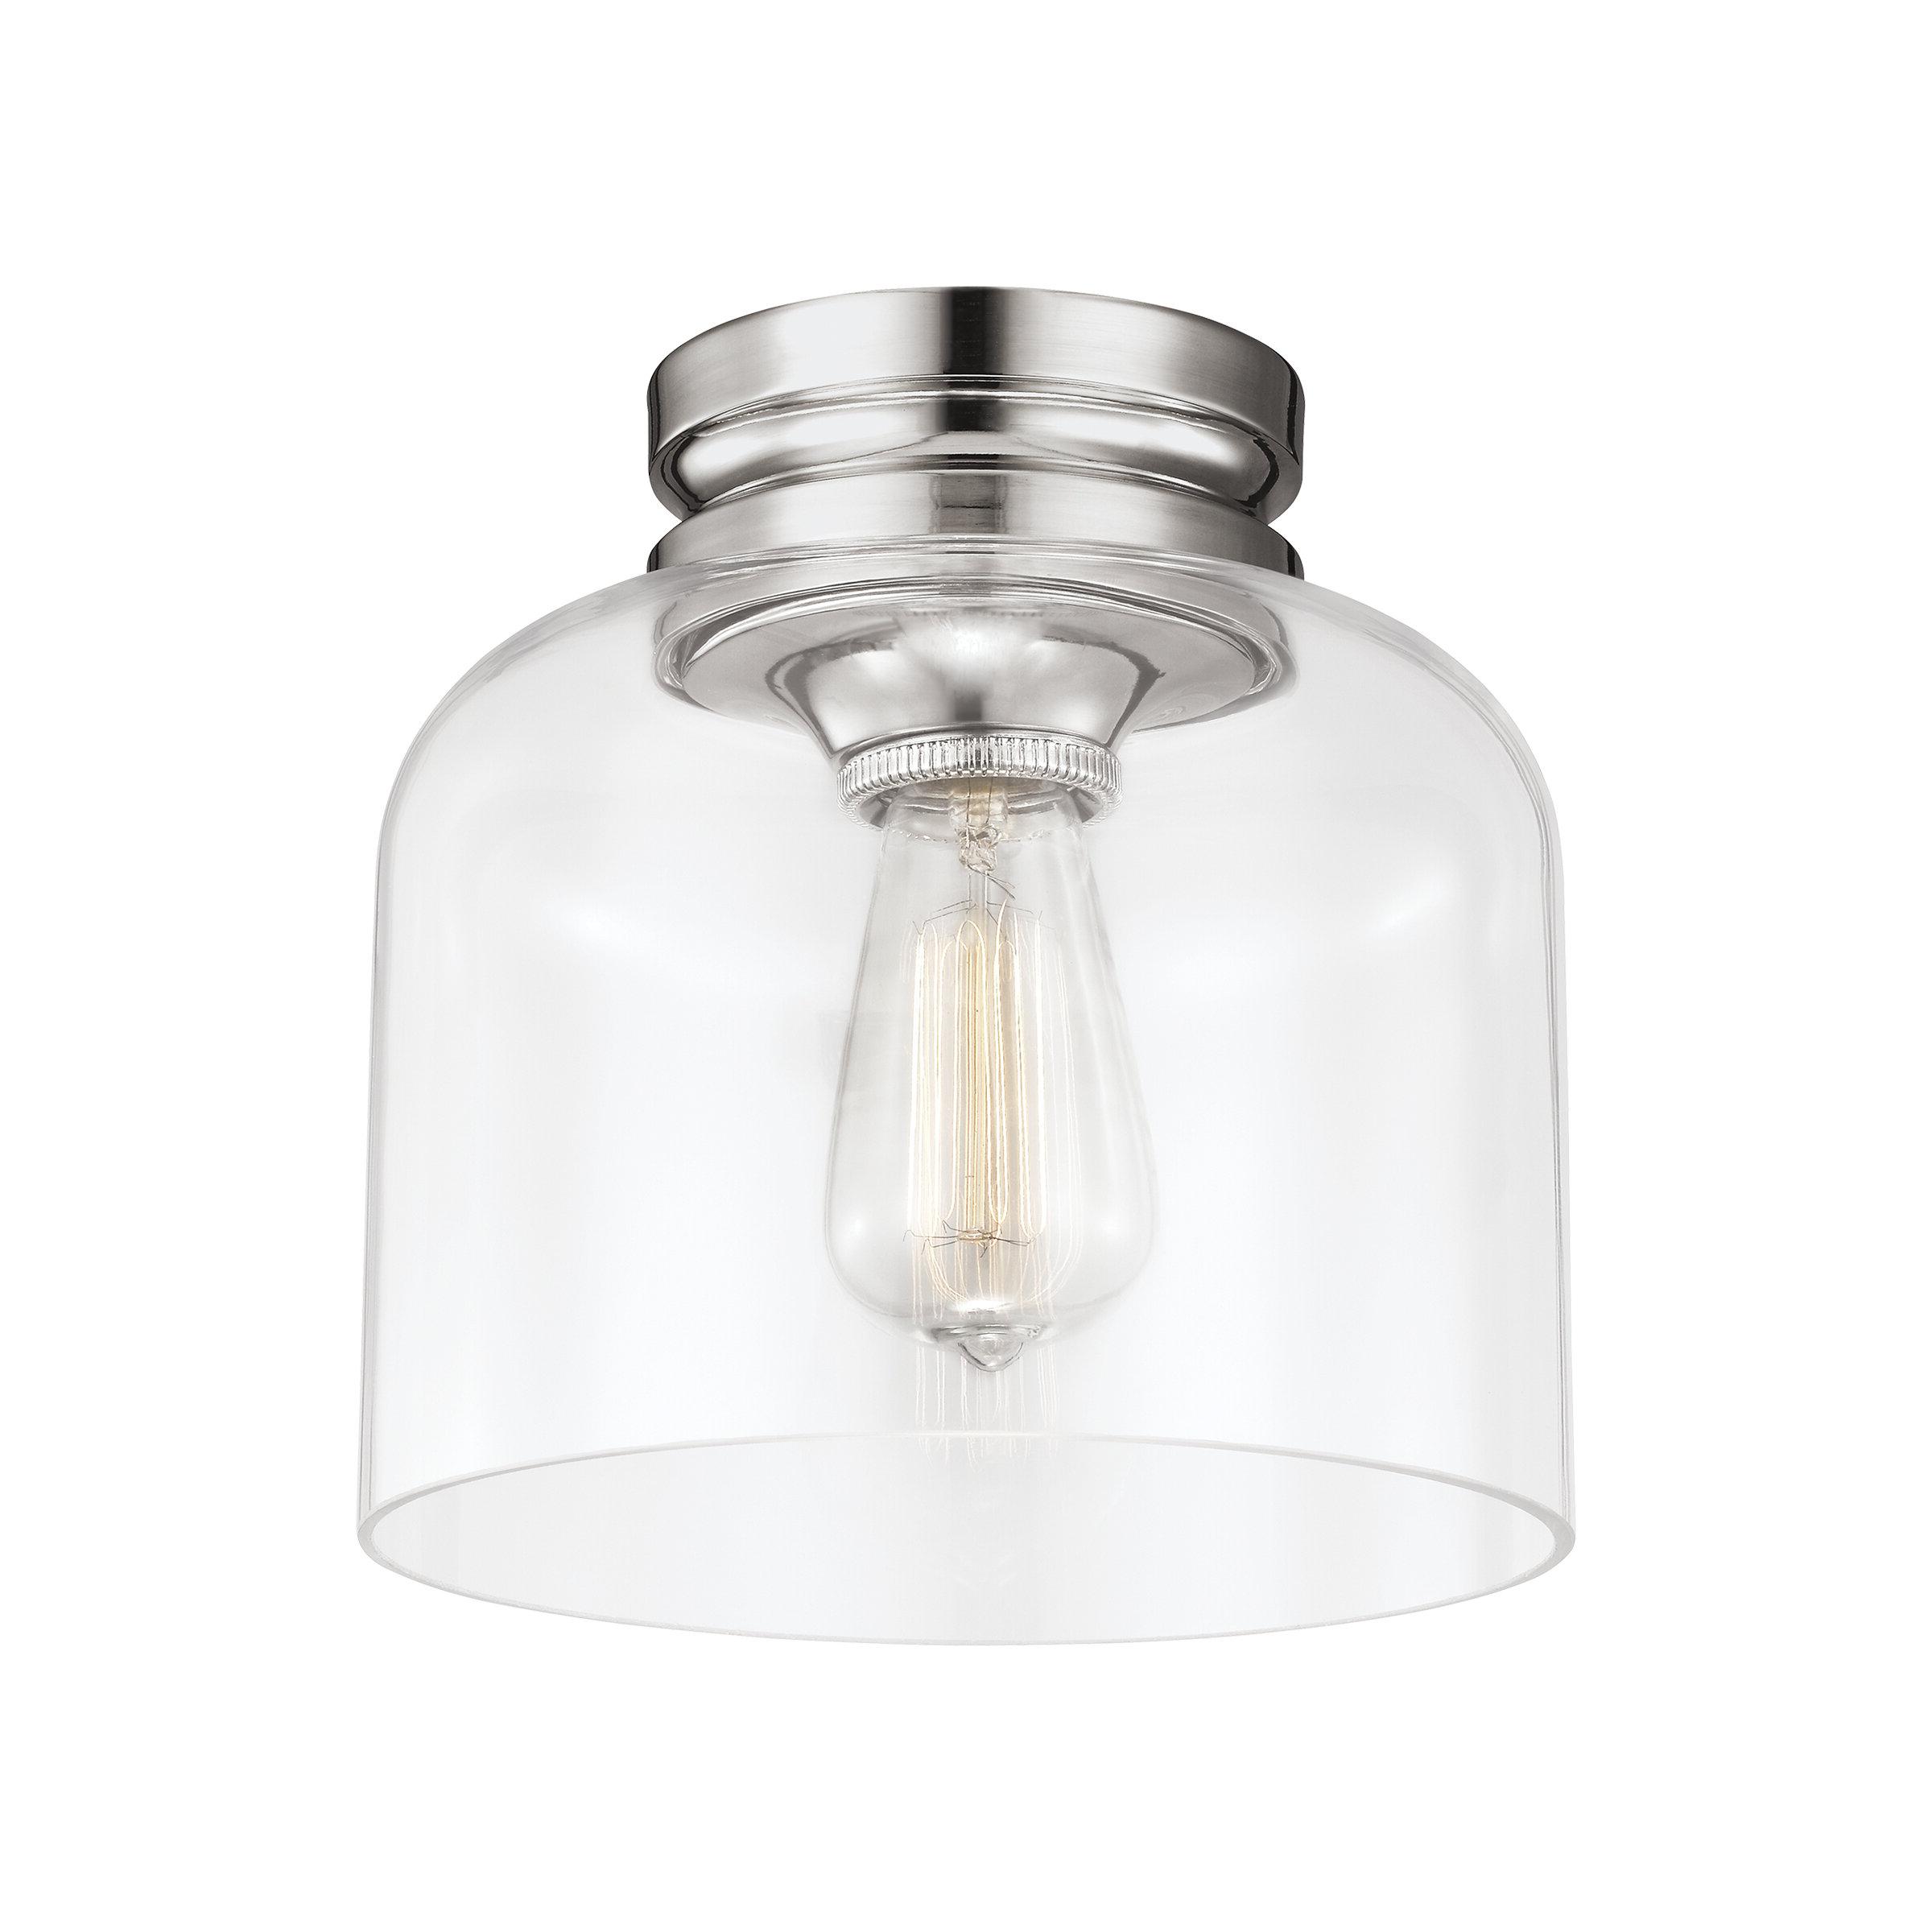 Nolan 1 Light Lantern Chandeliers Pertaining To Most Up To Date Nolan 1 Light Semi Flush Mount (View 10 of 25)